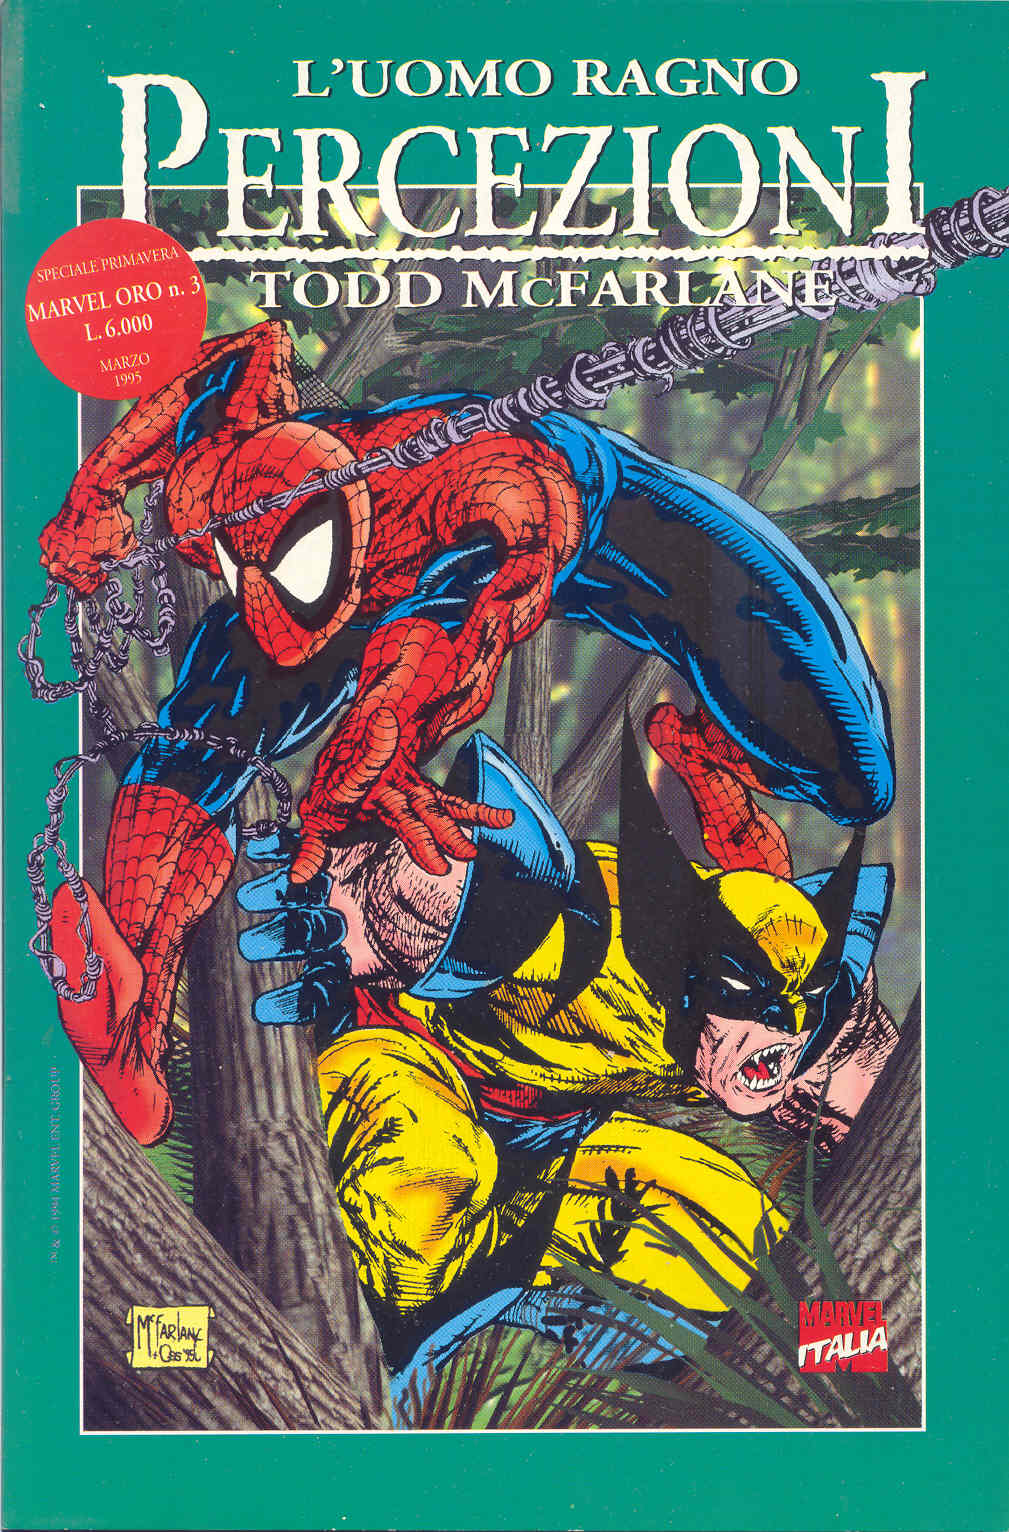 Marvel Oro n. 3